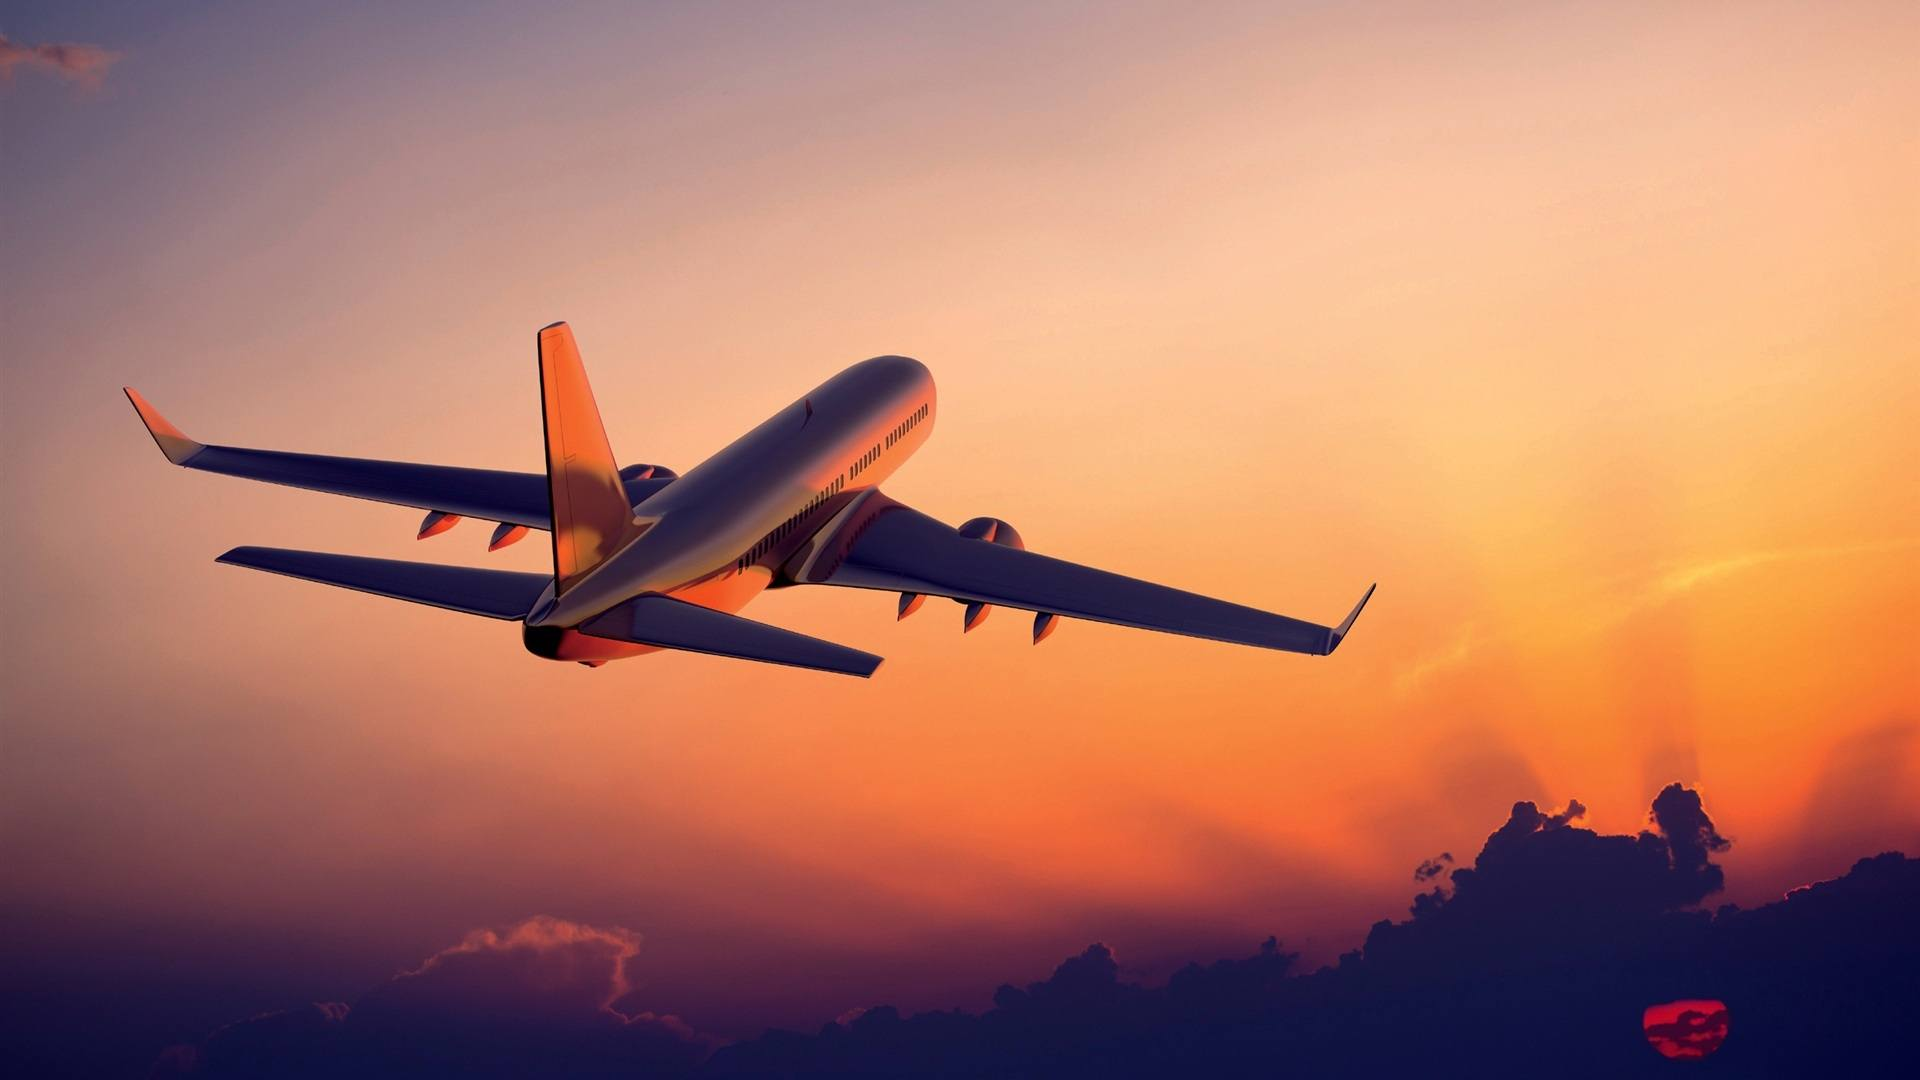 Orange Ofera 35 Euro Reducere La Orice Bilet De Avion De